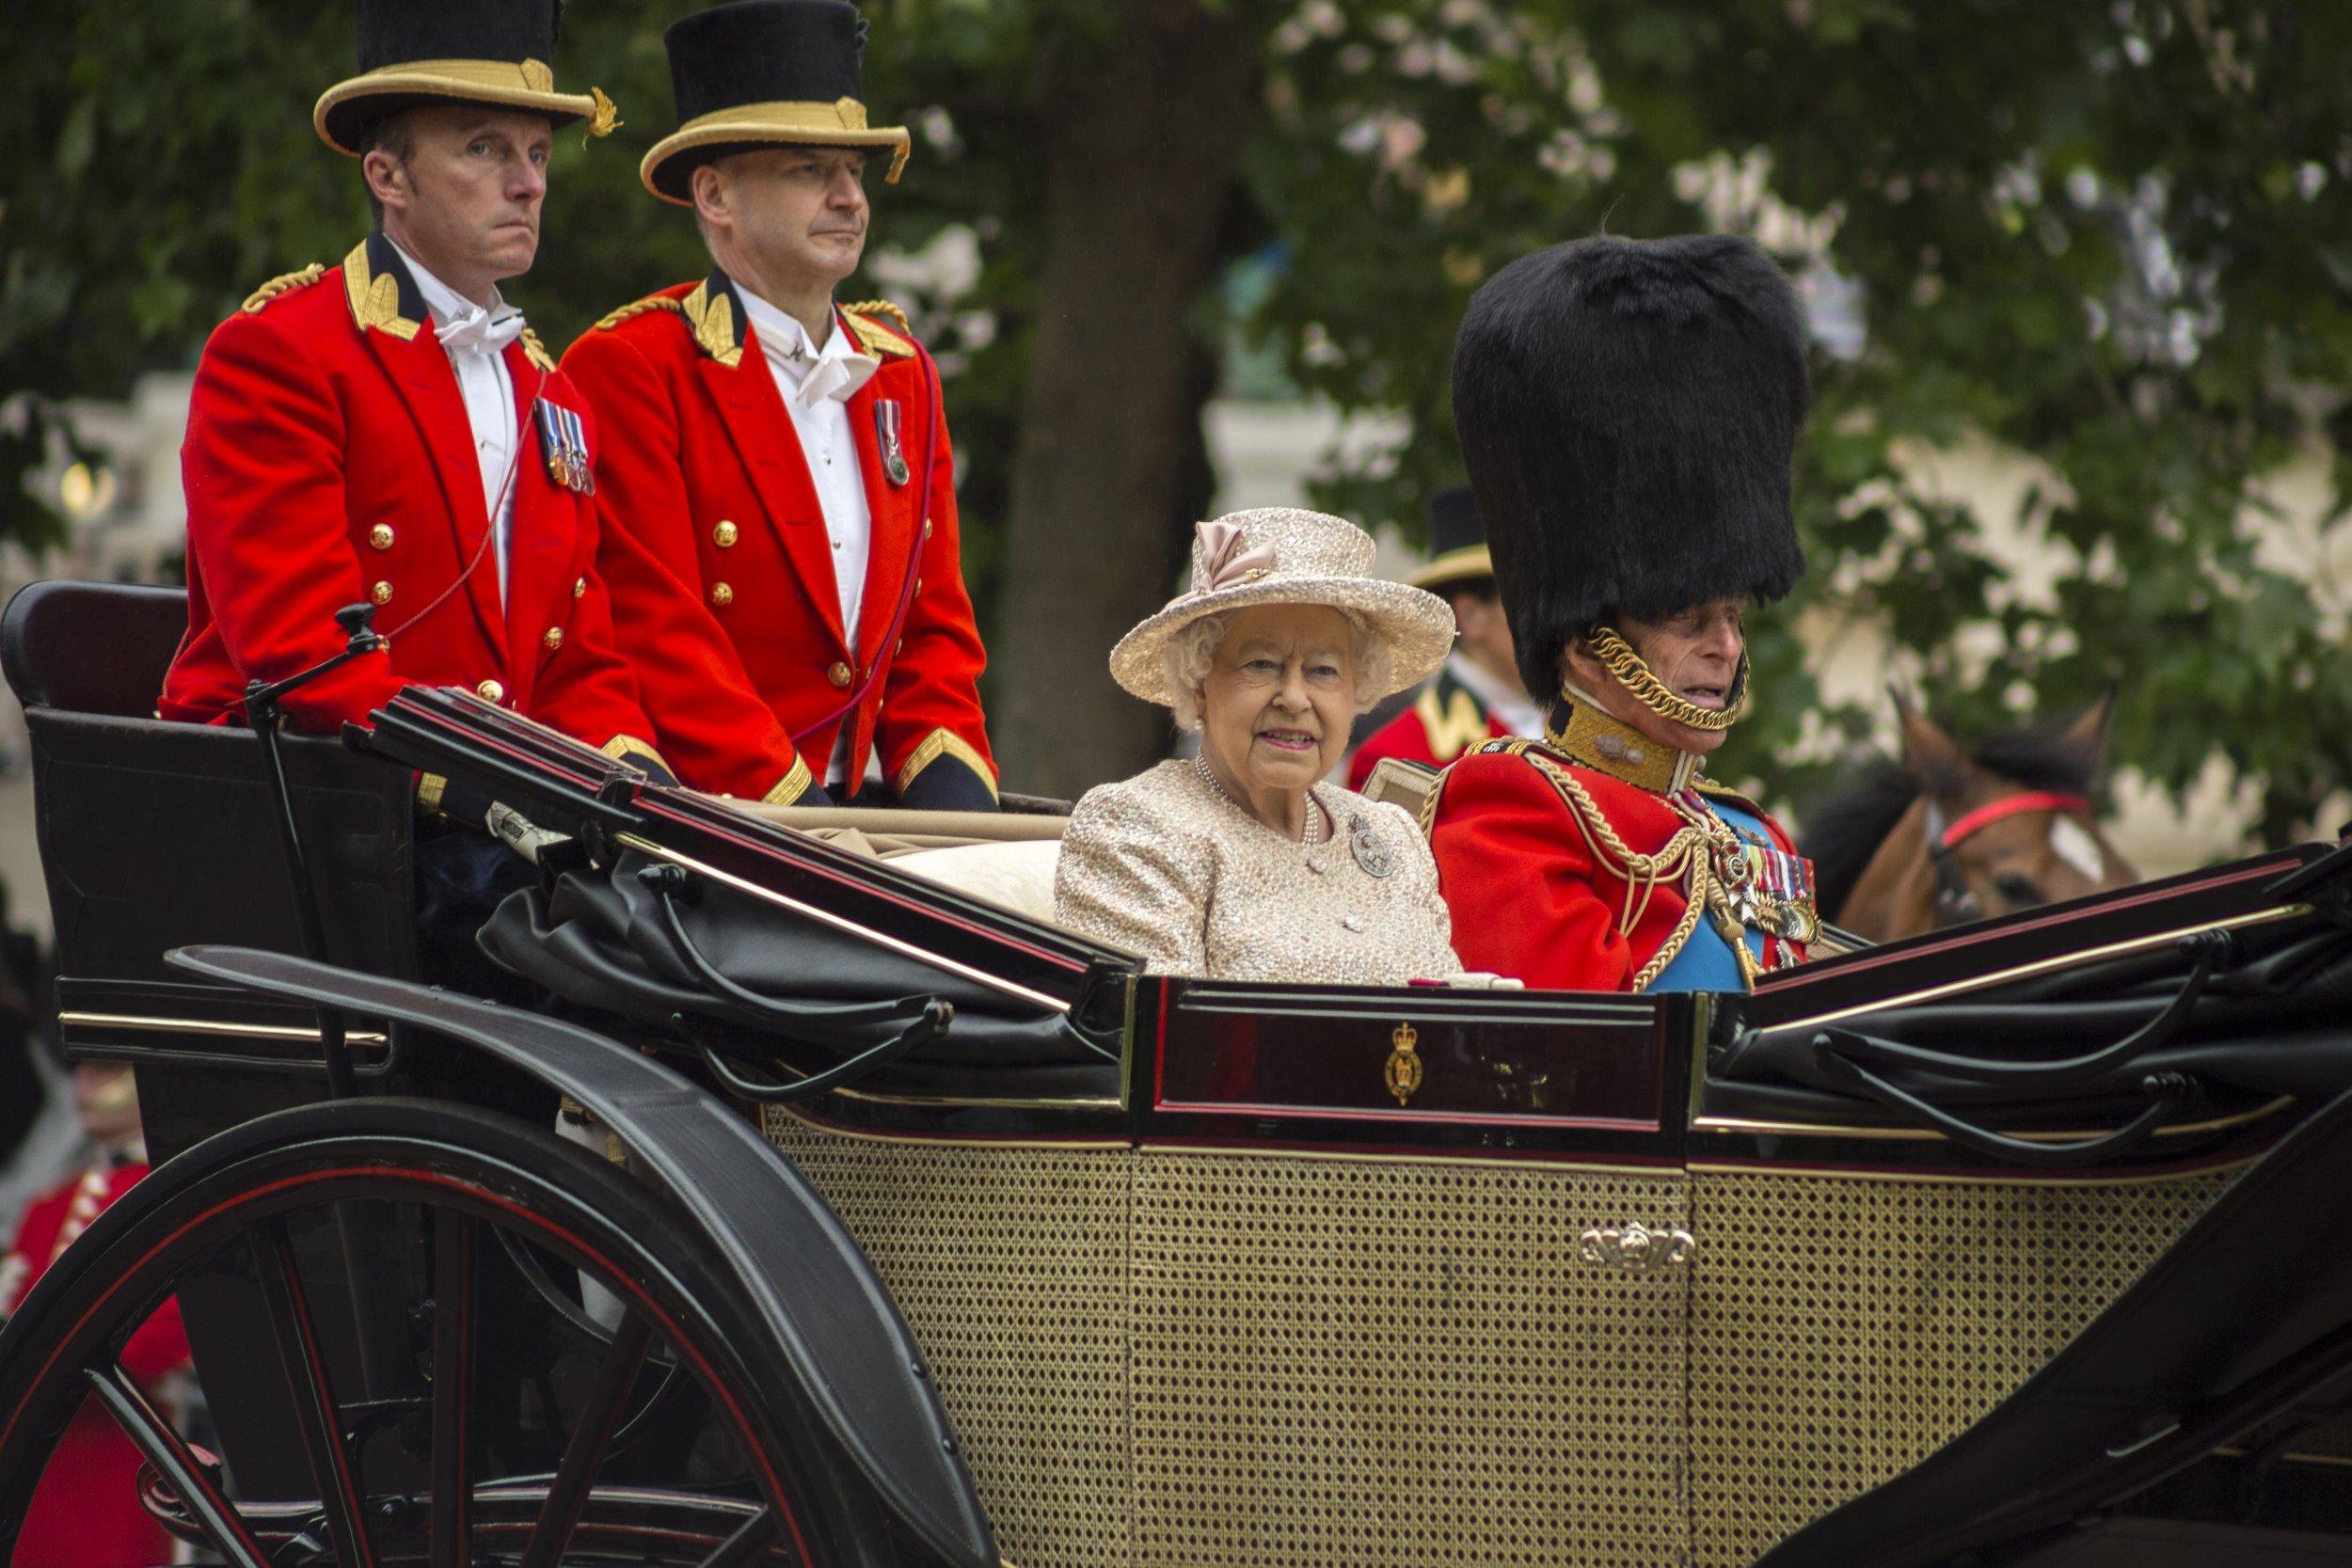 Queen Getty Images